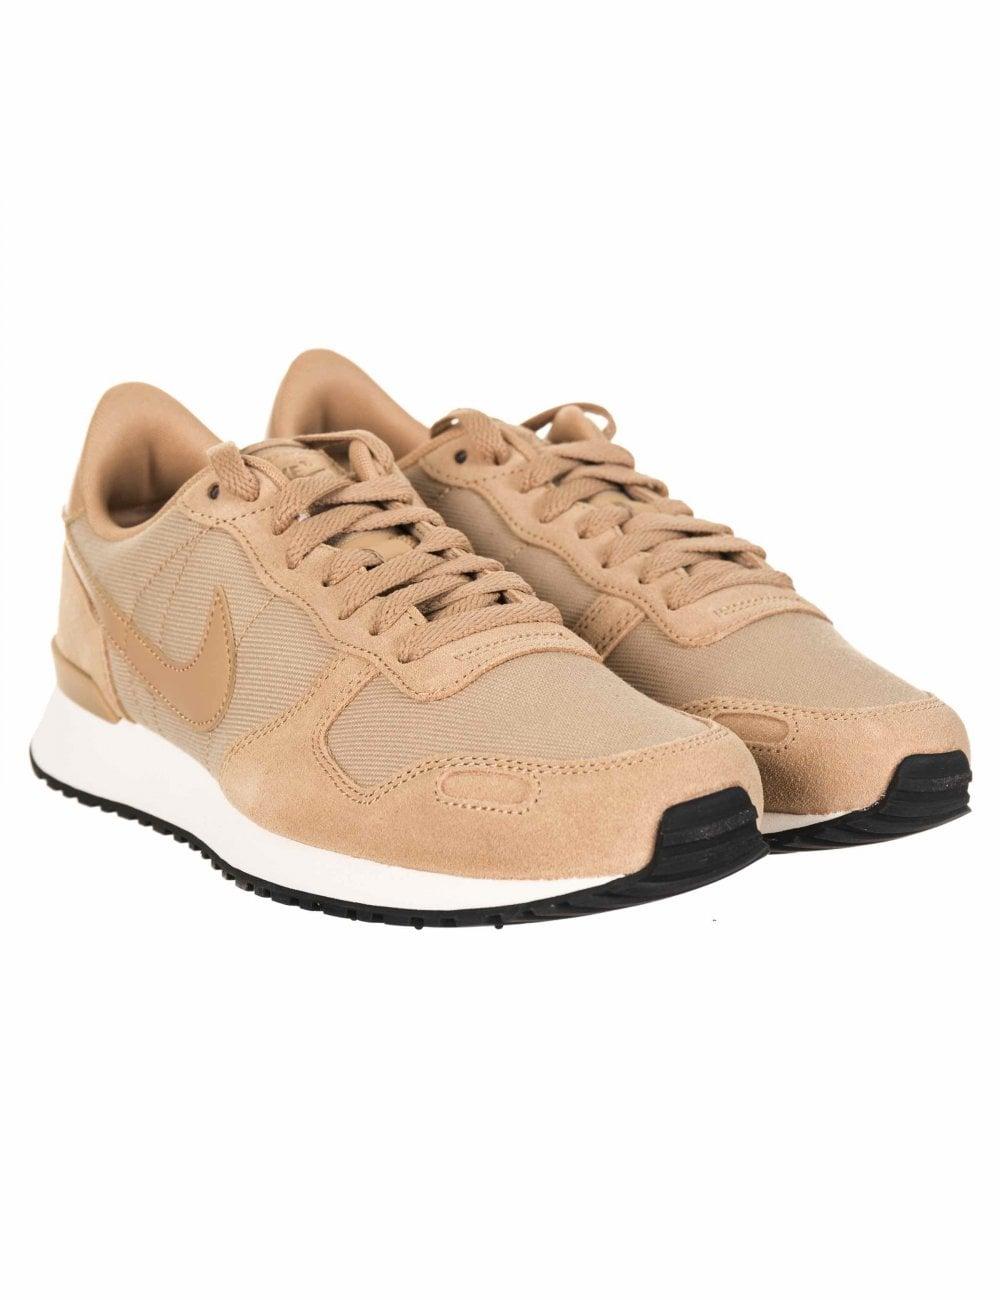 9b4e41043e68c0 Nike Air Vortex Ltr Trainers - Desert - Footwear from Fat Buddha ...